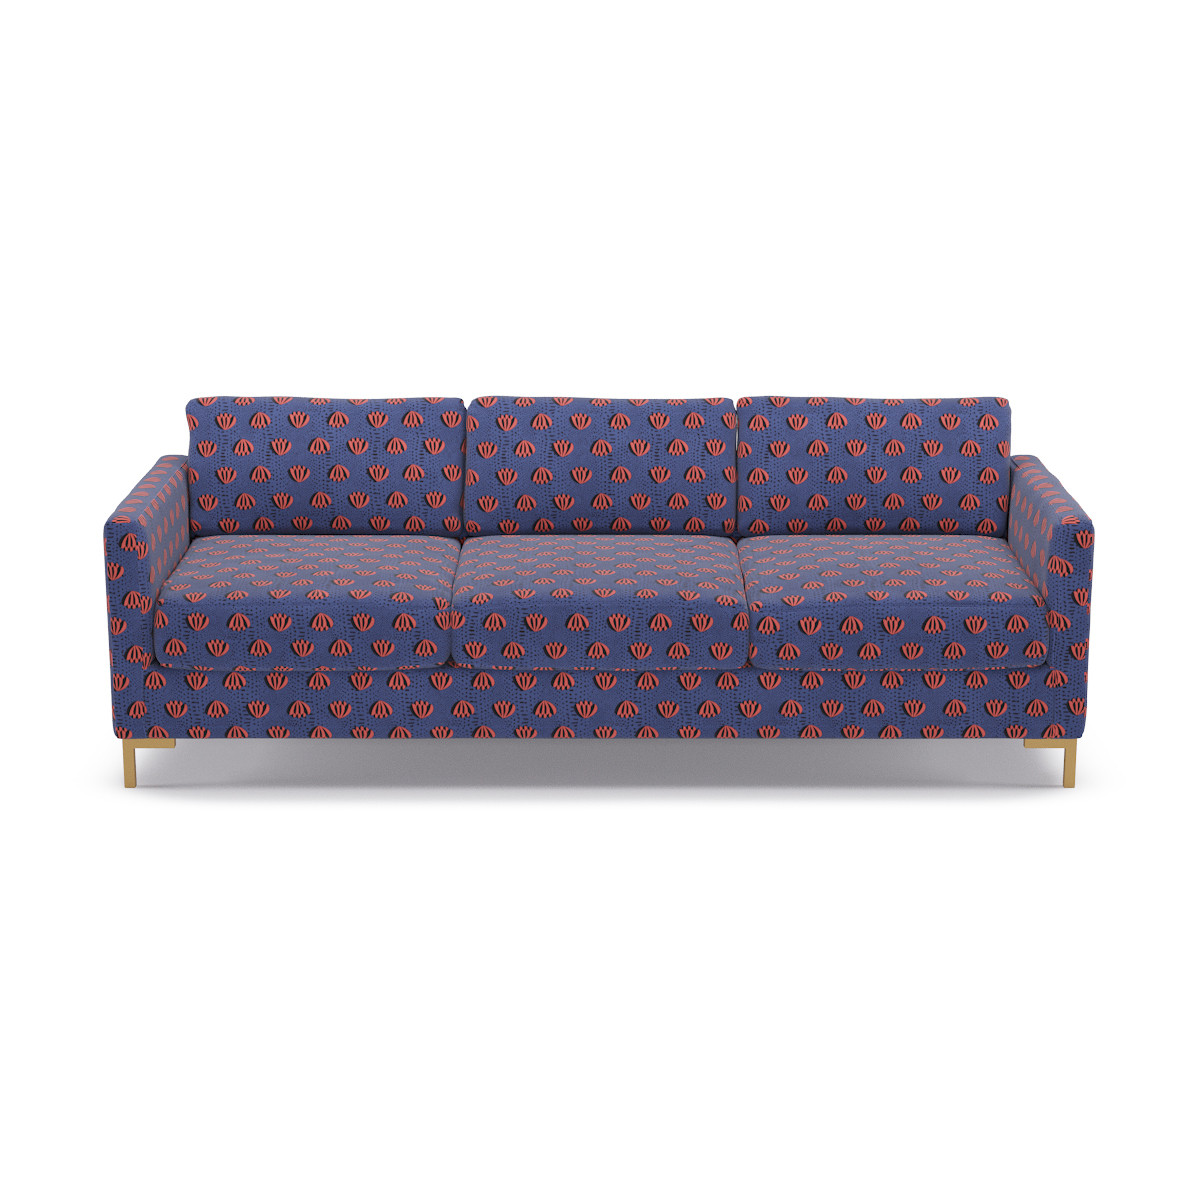 Fabulous Modern Sofa Blue Lotus Andrewgaddart Wooden Chair Designs For Living Room Andrewgaddartcom